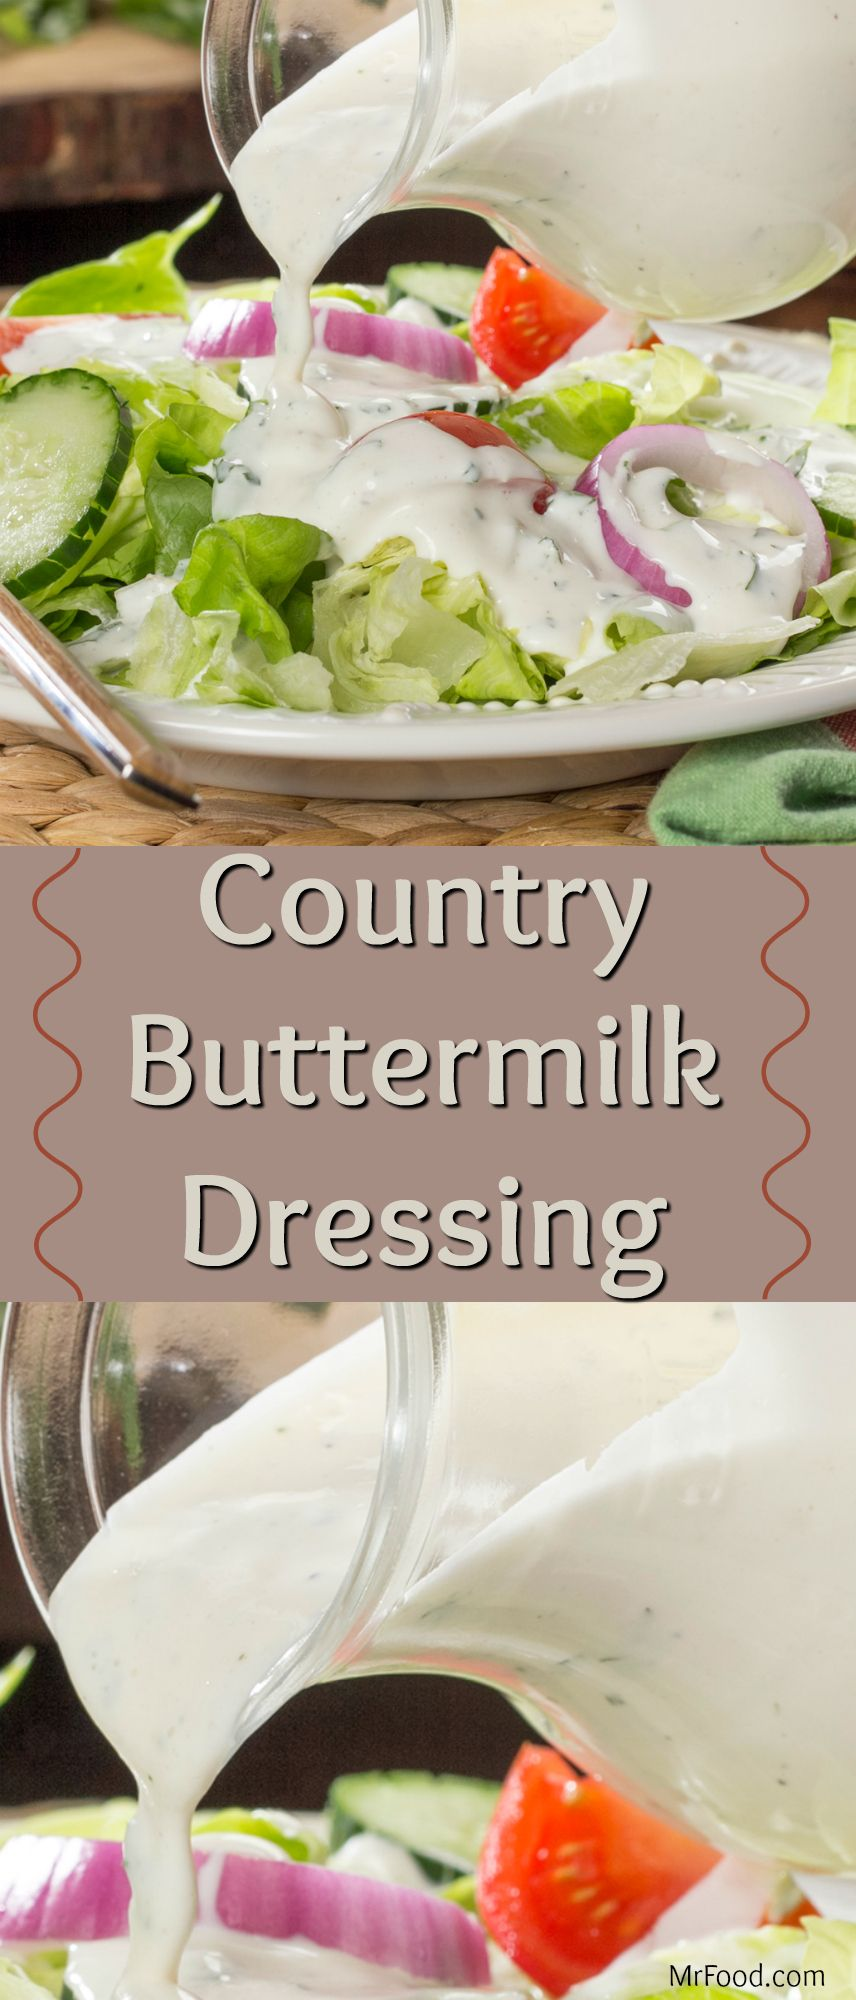 Country Buttermilk Dressing Recipe Buttermilk Salad Dressing Homemade Salad Dressing Delicious Salads